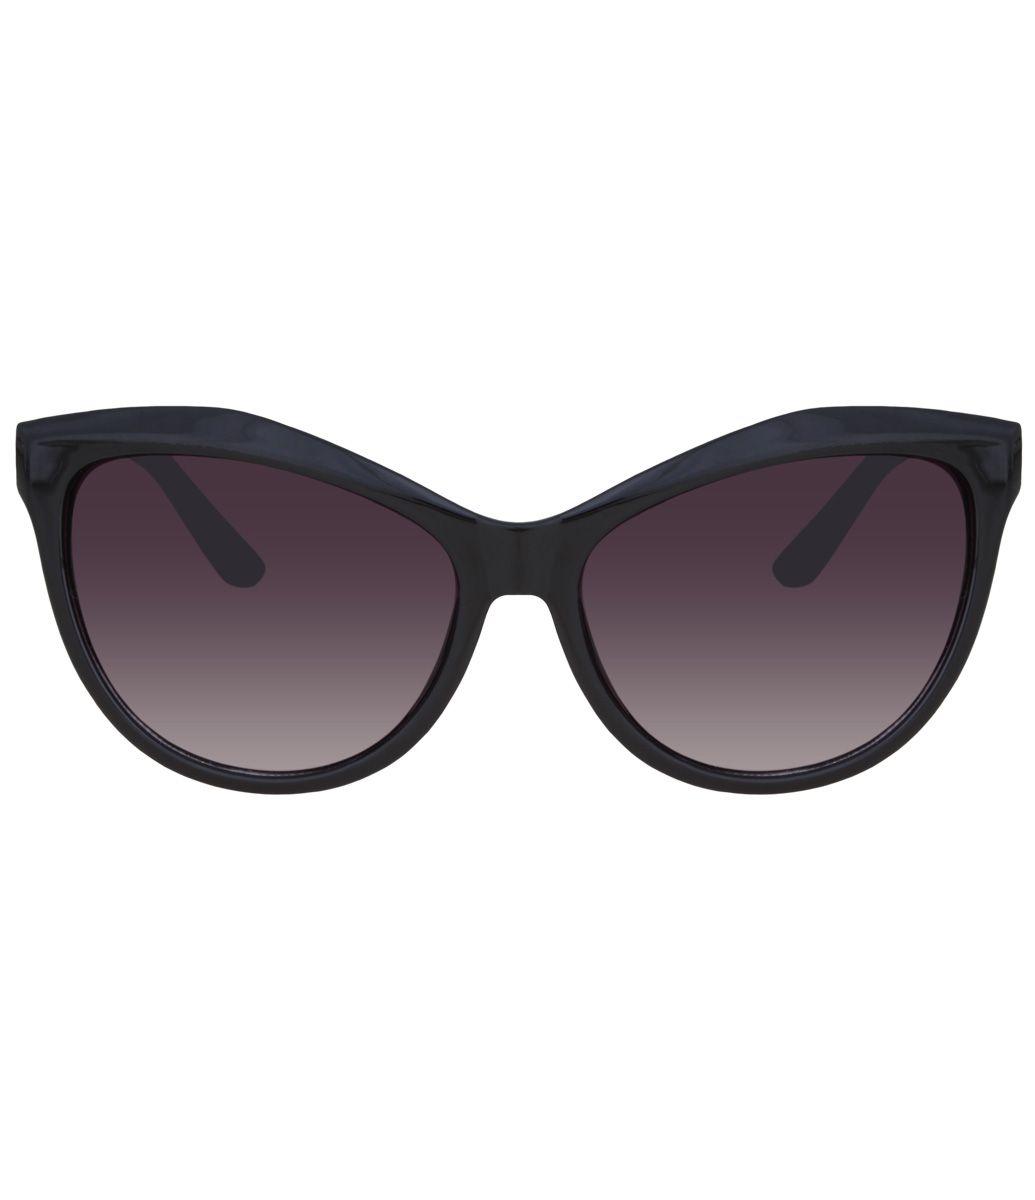 a093b616adb83 Óculos de Sol Feminino Redondo - Lojas Renner   Wardrobe Wishlist ...